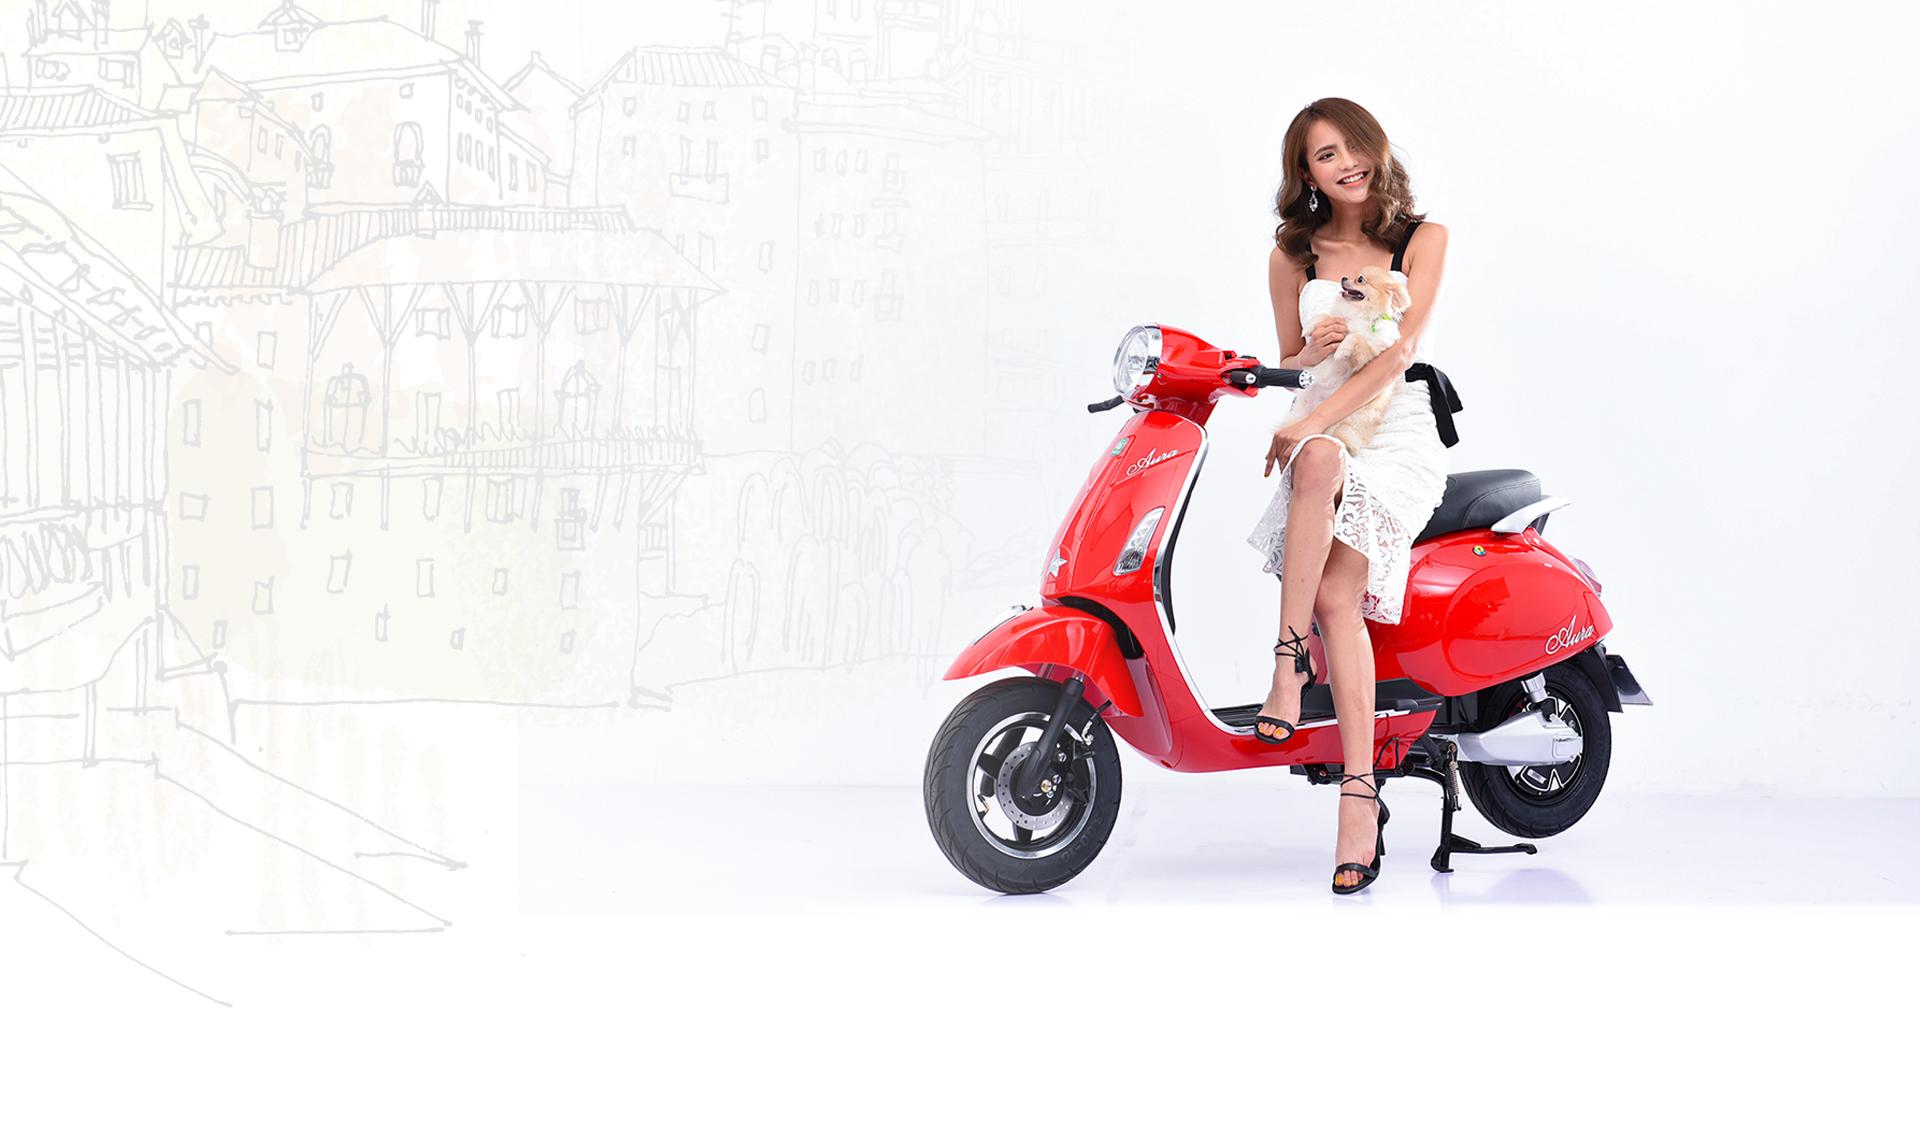 Pega Aura - Xe máy điện kiểu Ý